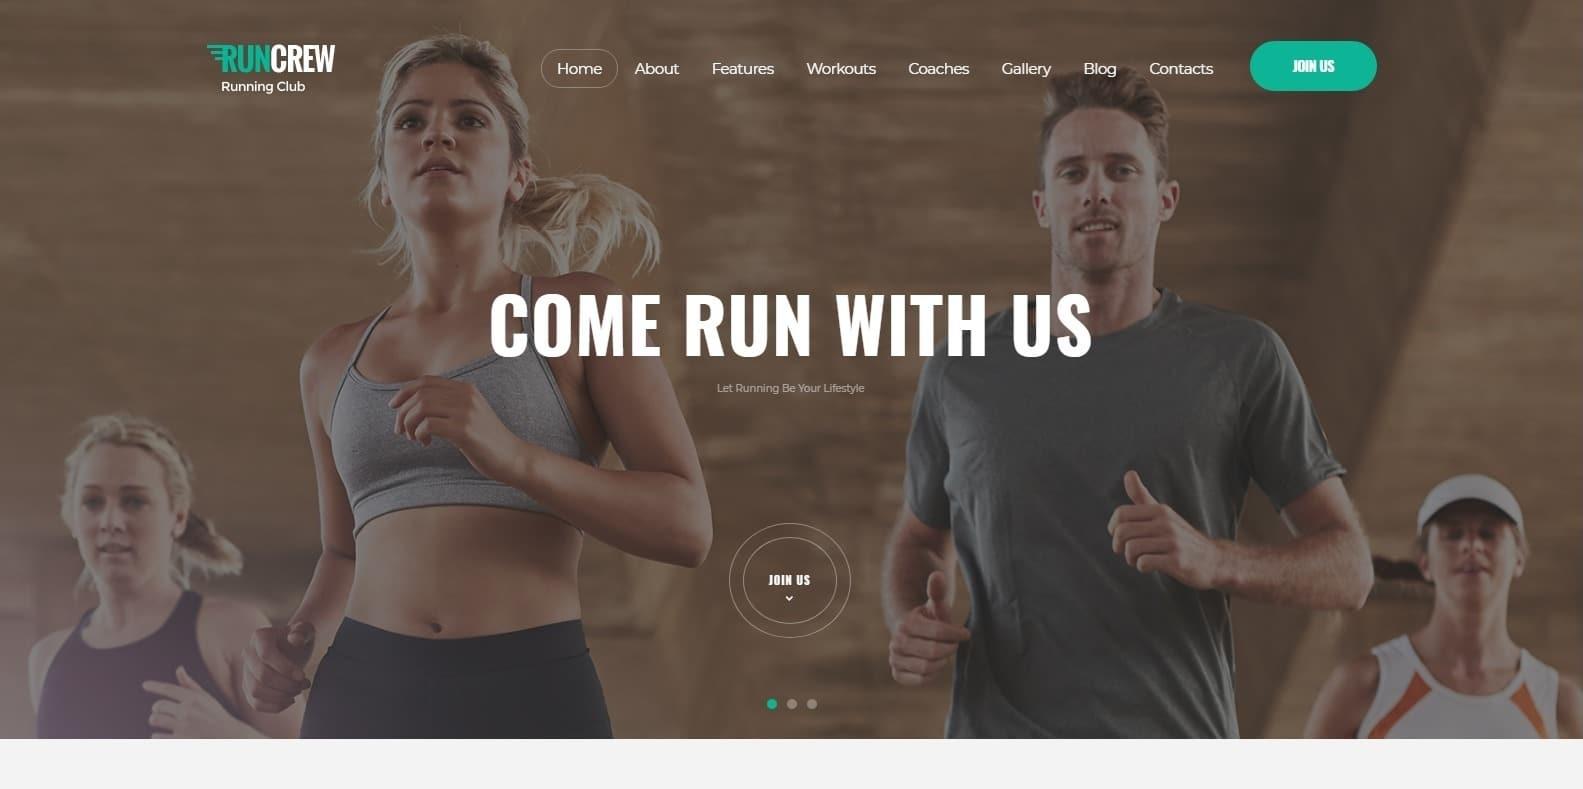 run-crew-sports-website-template